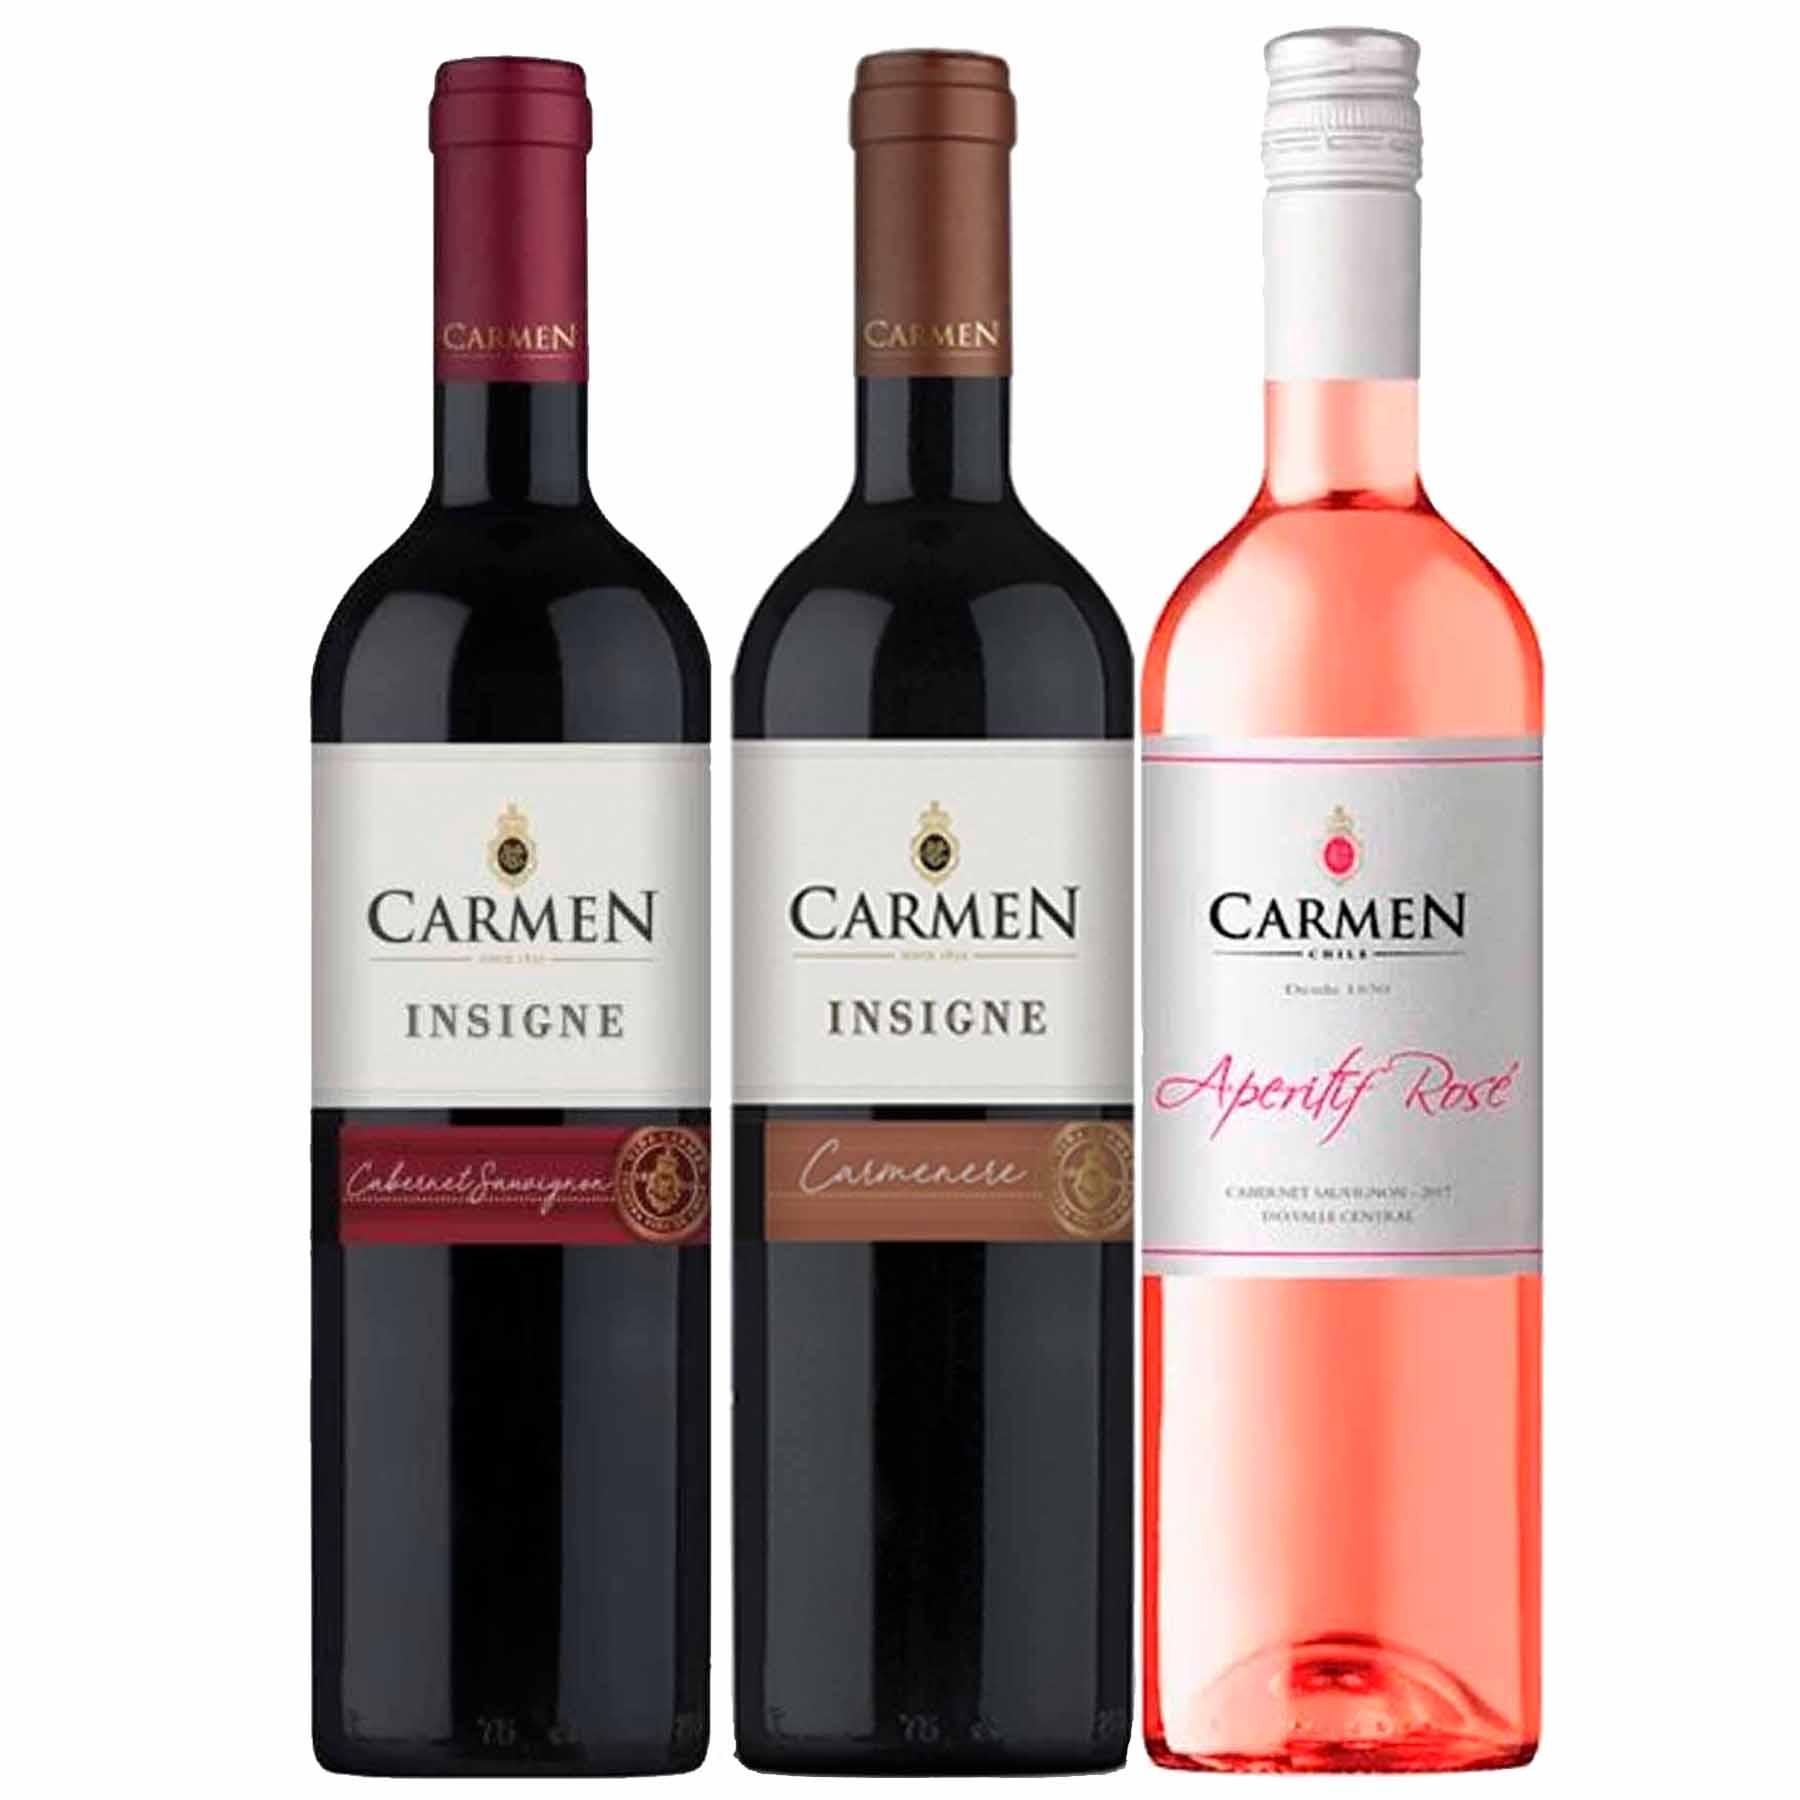 Kit 3 Vinhos Chilenos Carmen Insigne Cabernet Sauvignon, Carmenere e Rosé